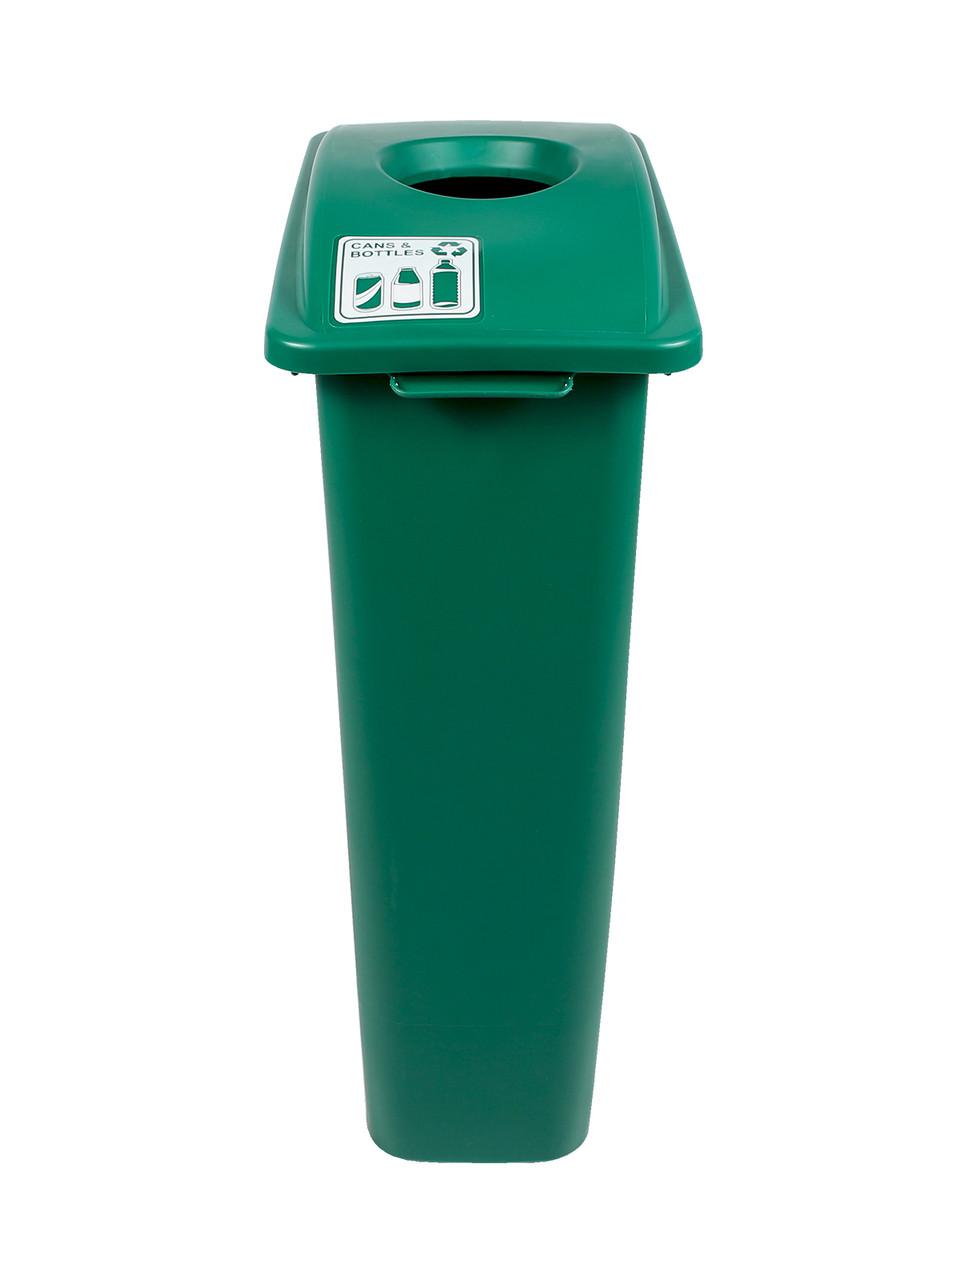 23 Gallon Green Skinny Simple Sort Recycle Bin